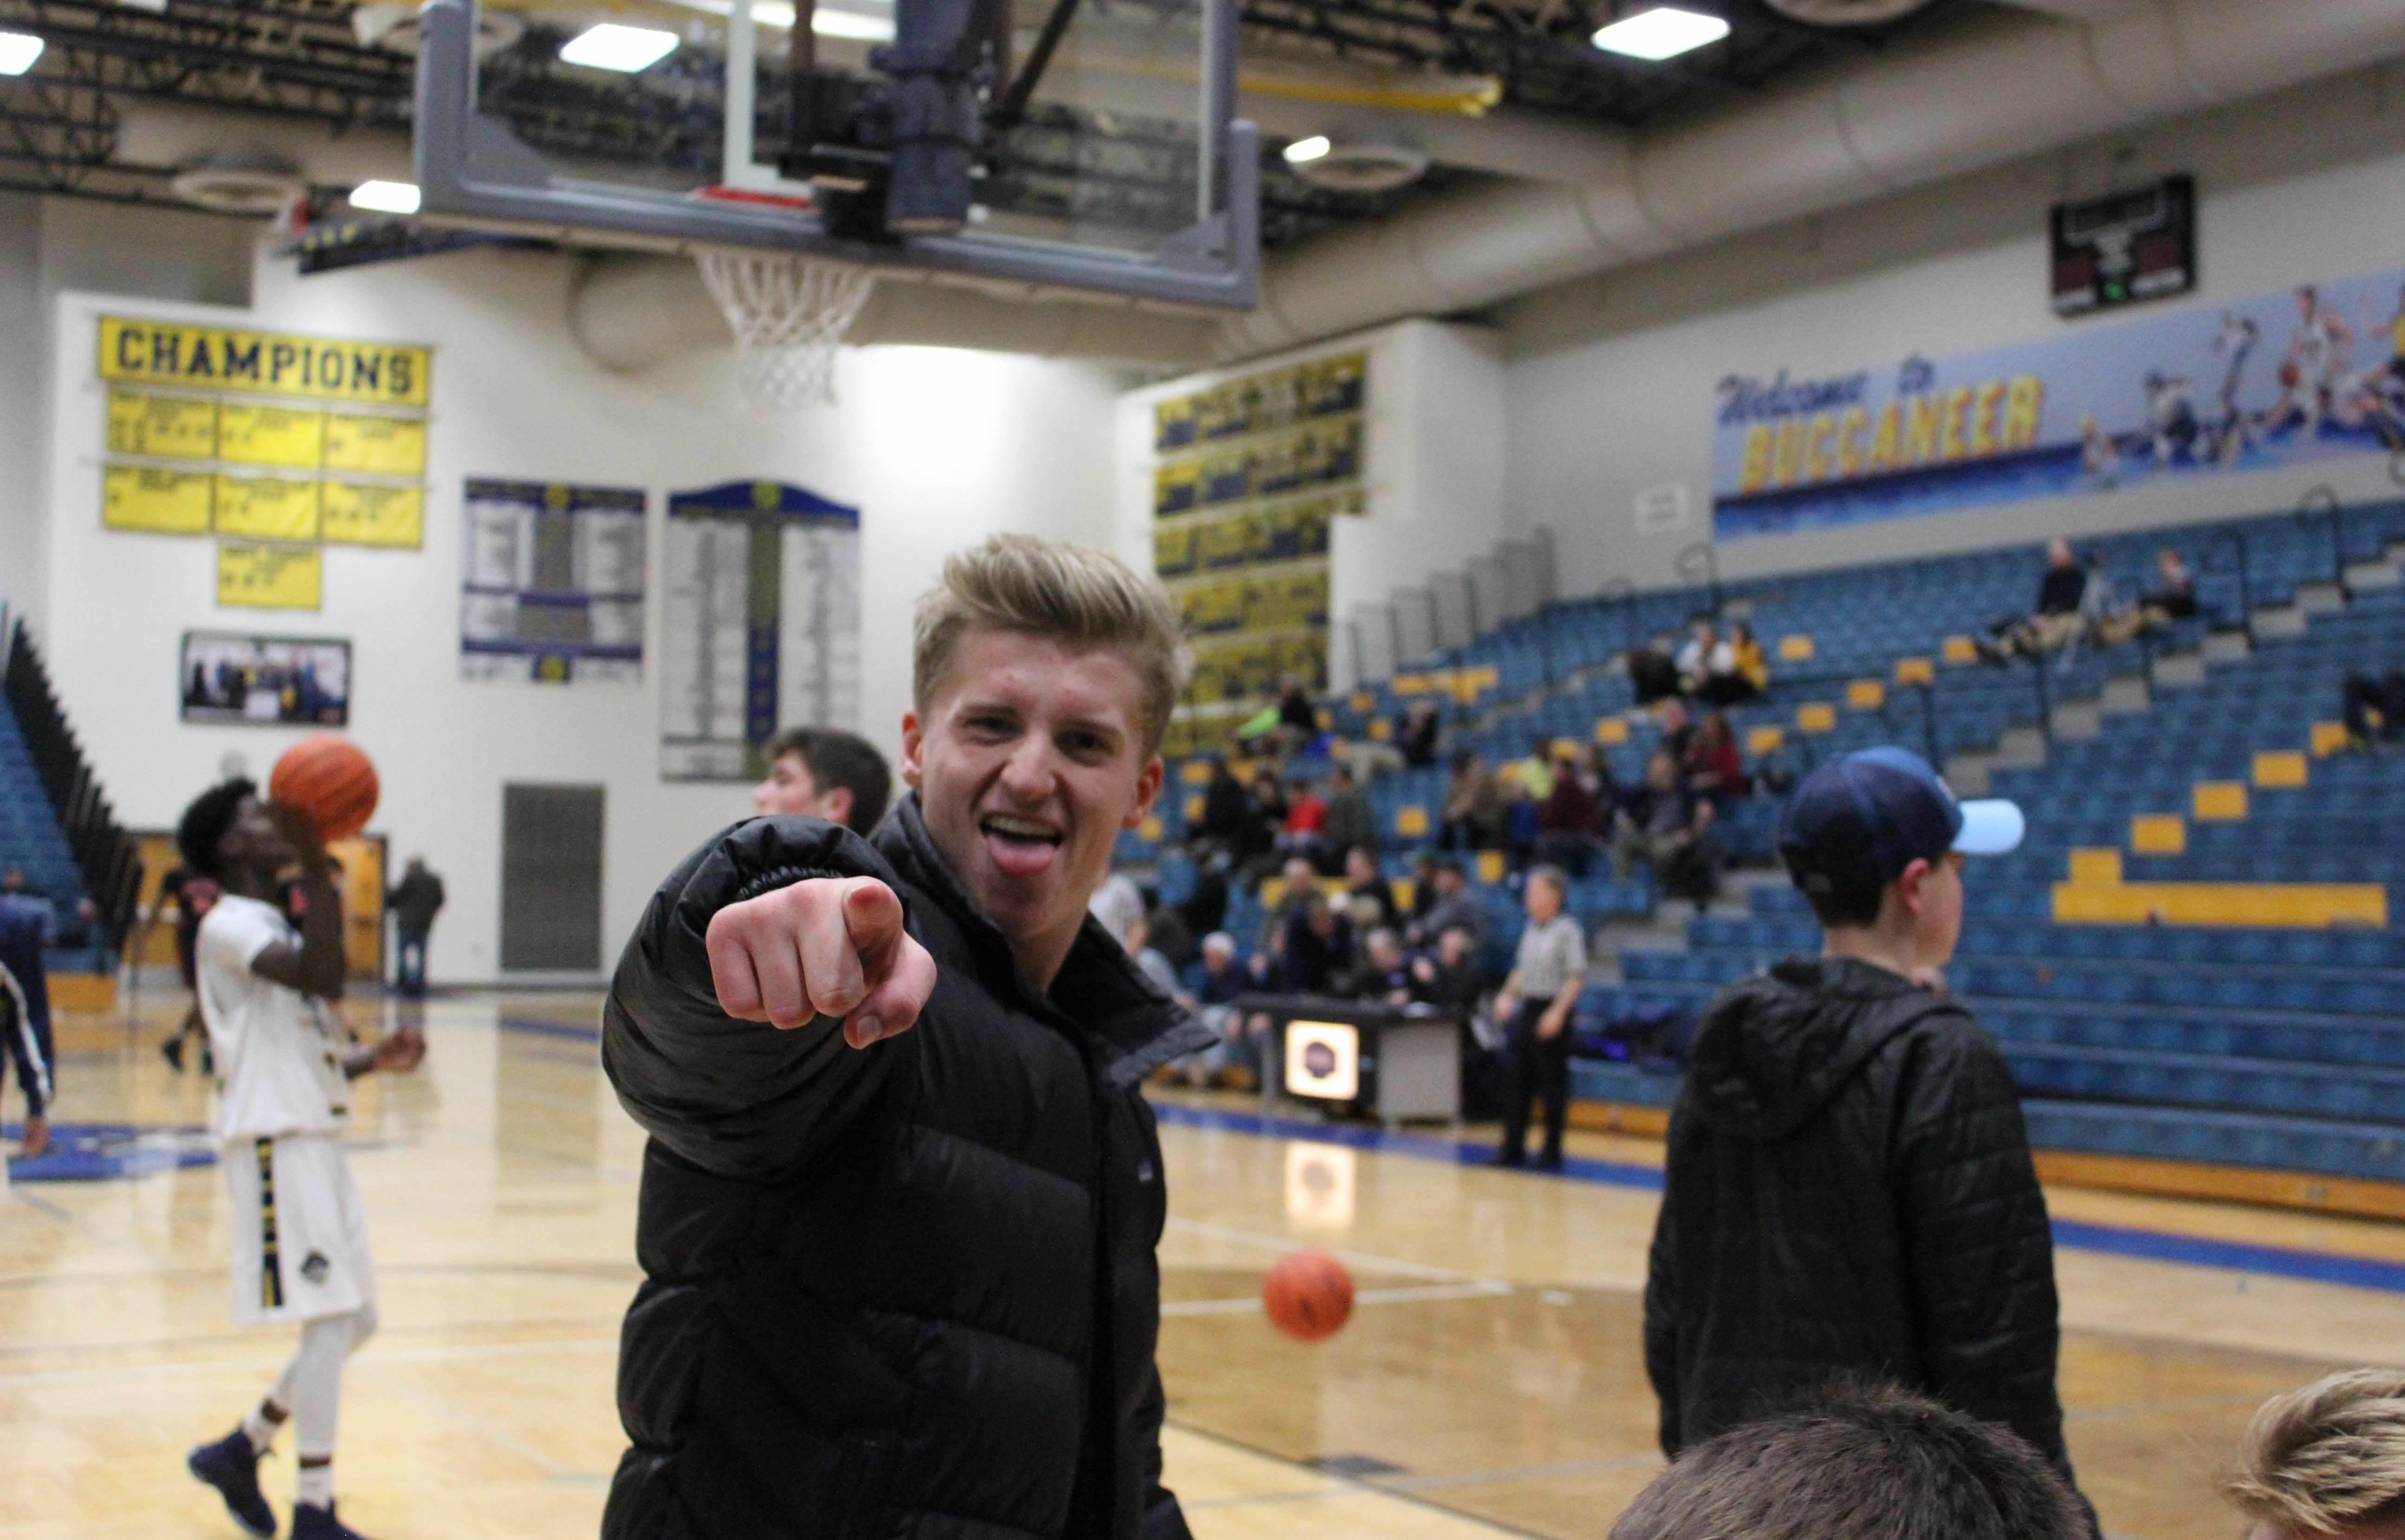 Jack Reus at a basketball game expressing his enthusiasm